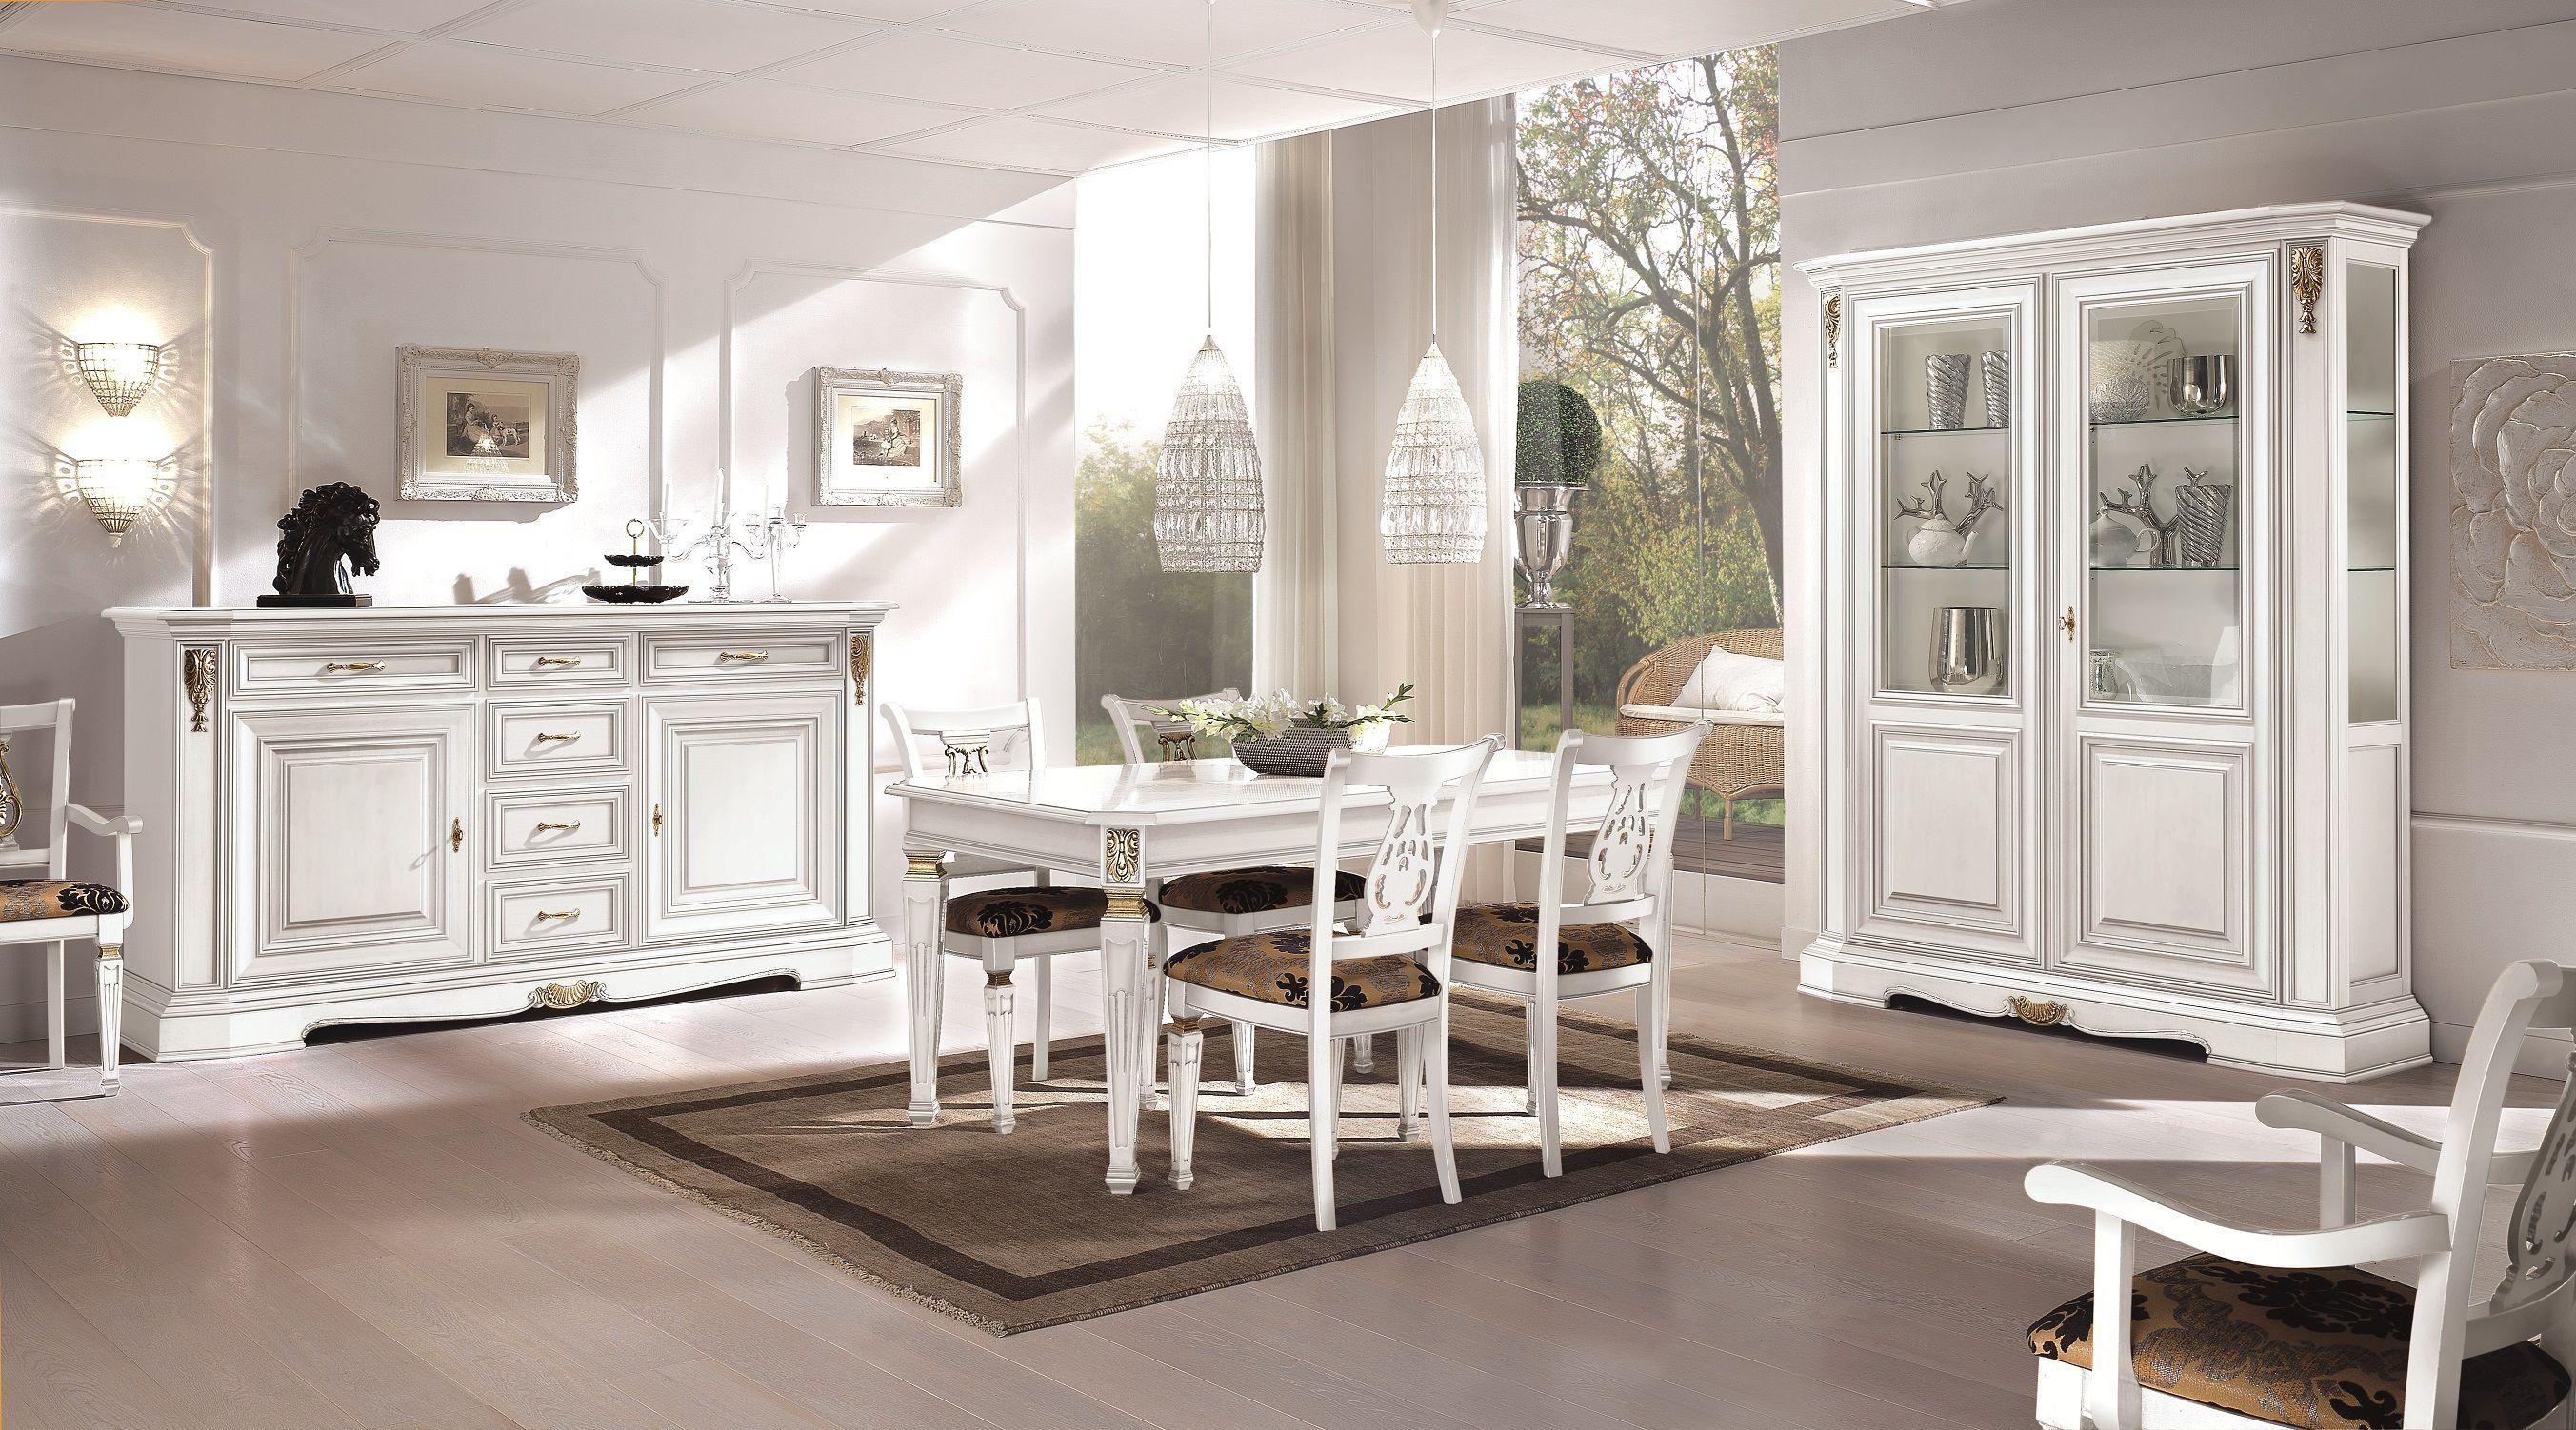 Piccoli tavoli da cucina great kitchen decor ideas - Tavoli da cucina per piccoli spazi ...